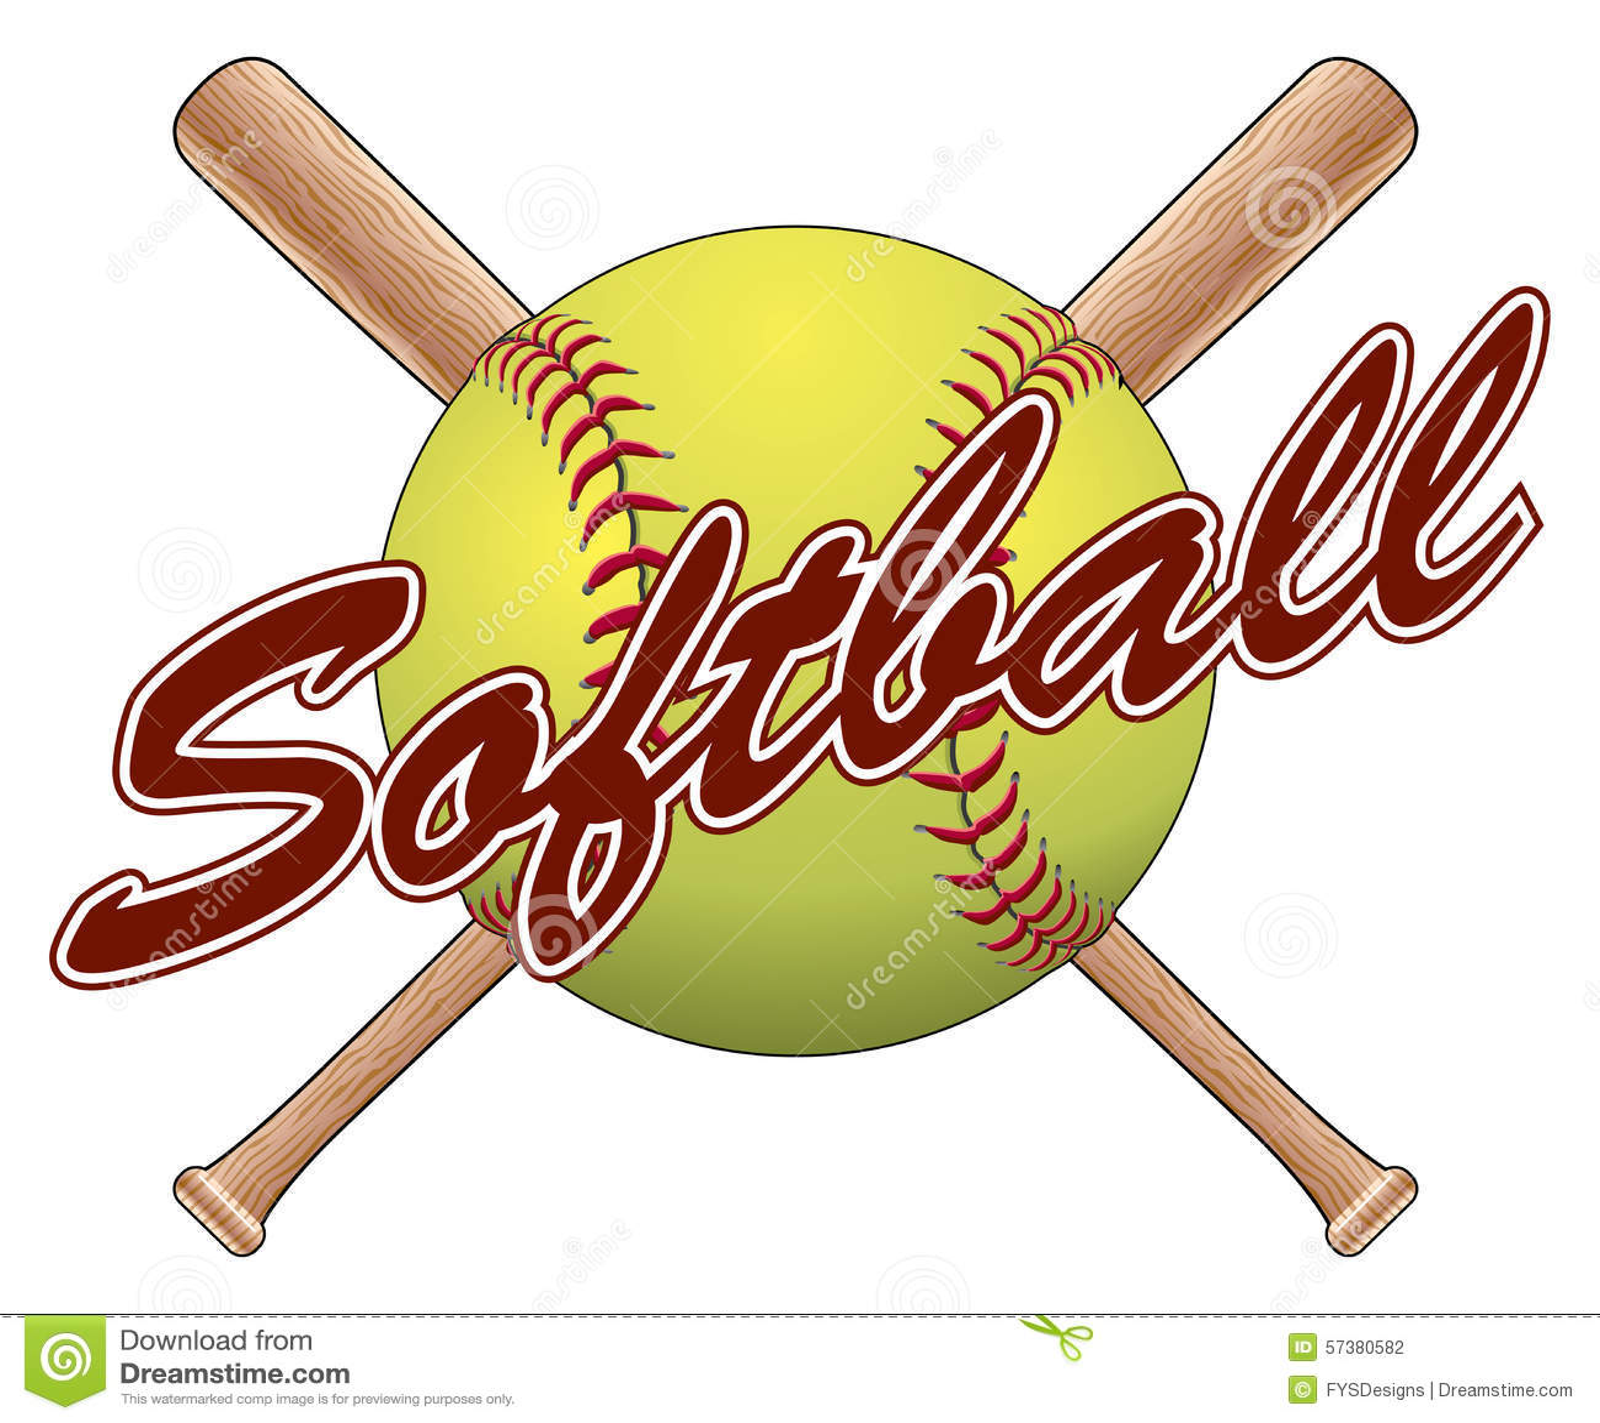 Softball Team Design